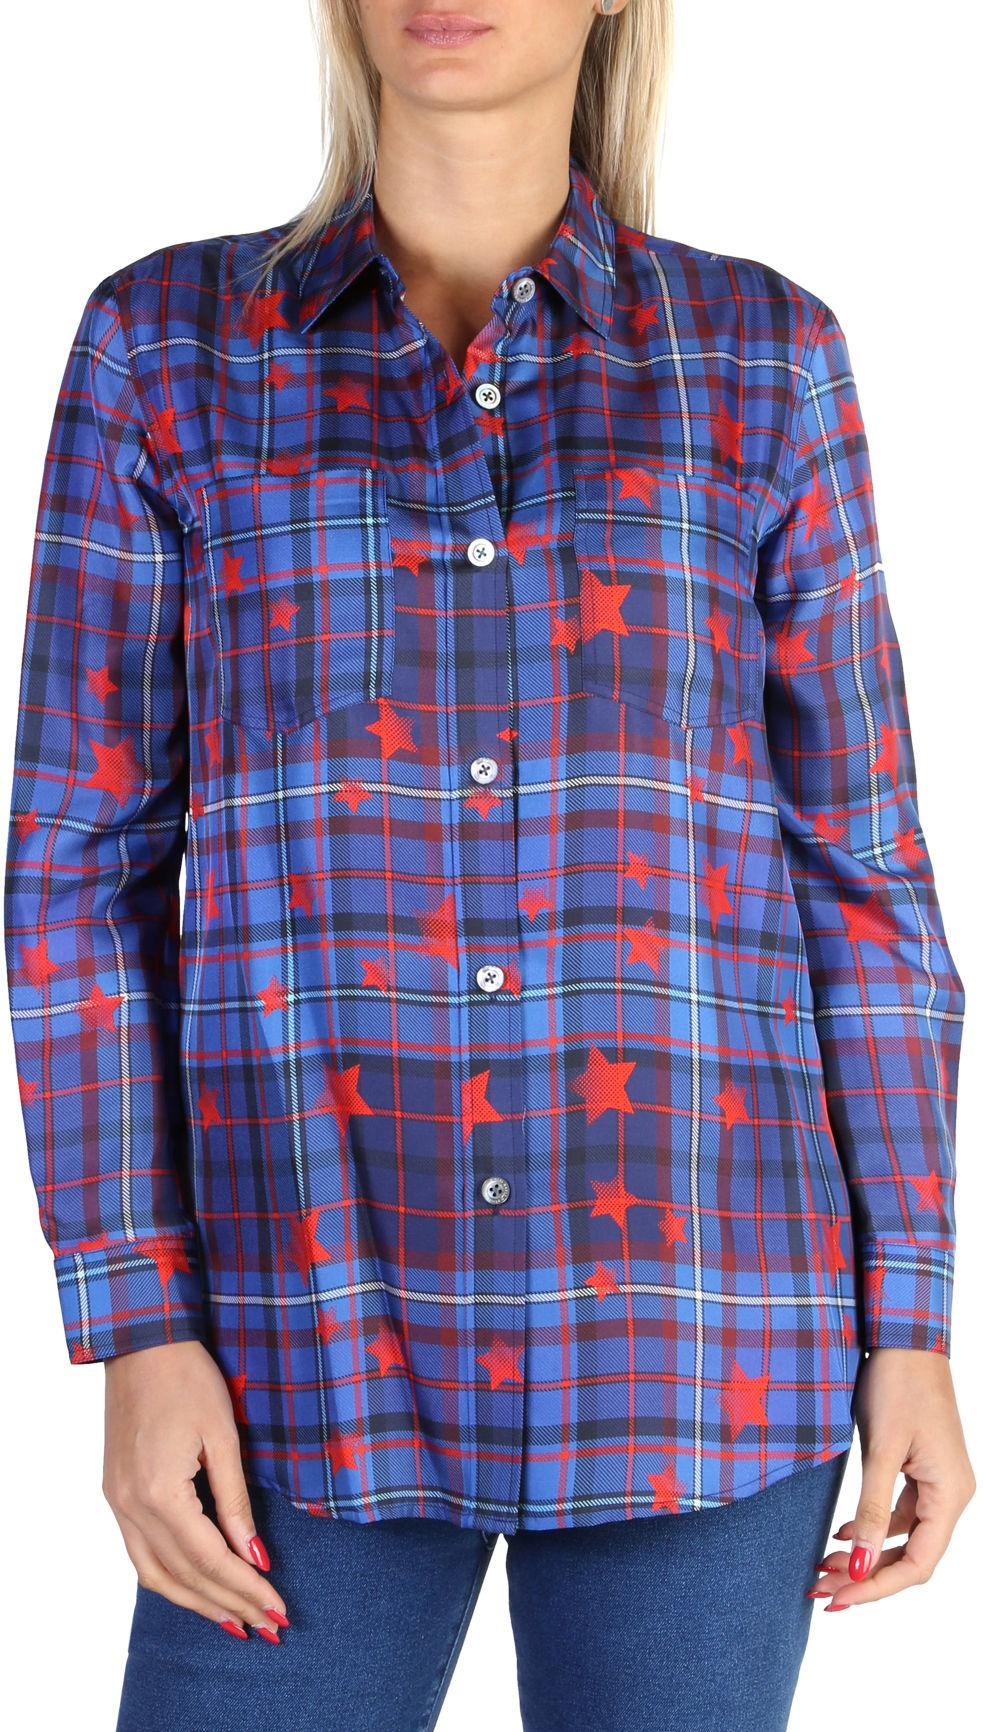 Tommy Hilfiger Koszule damskie